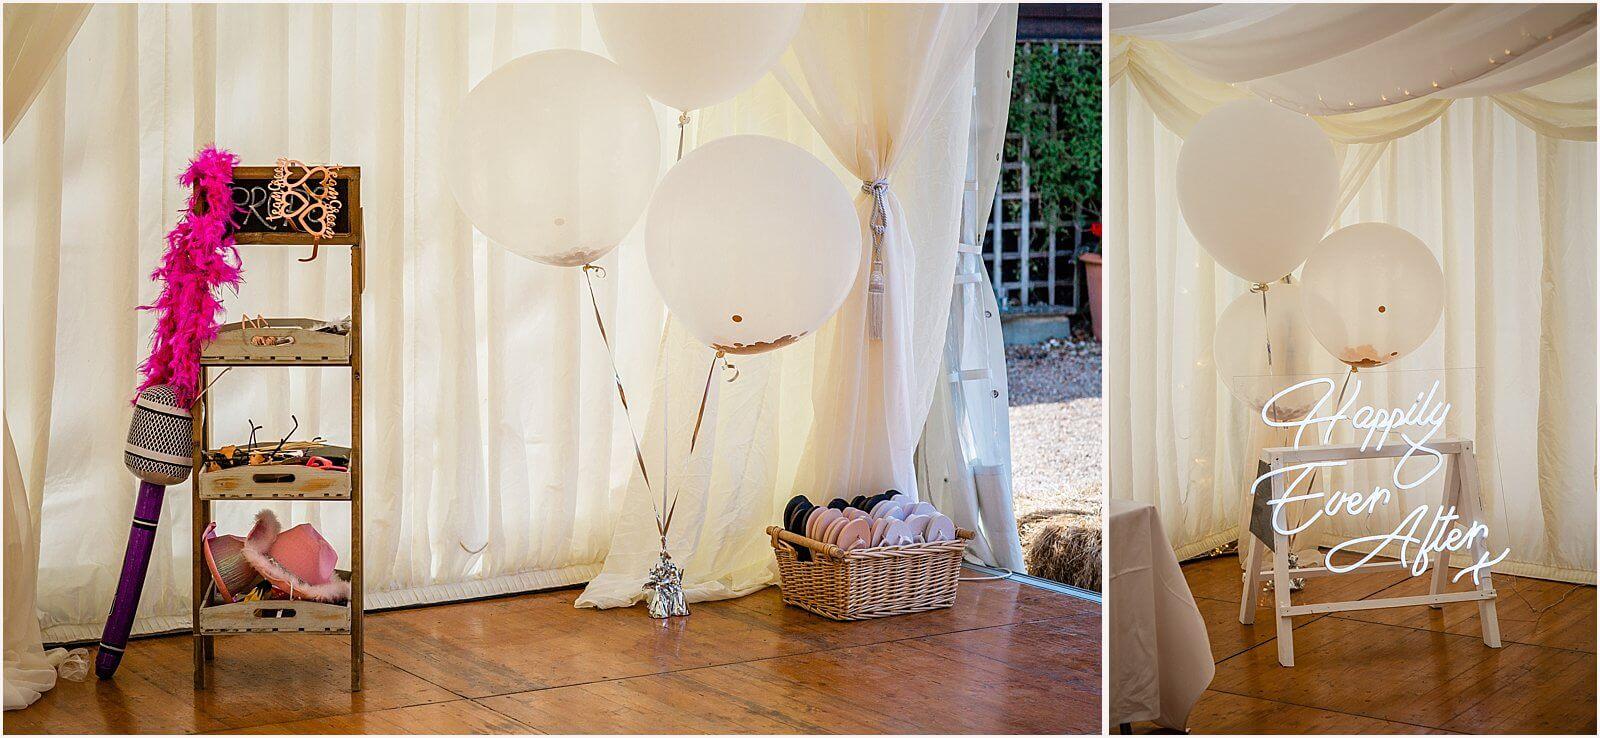 Swallows Oast Wedding - Jakki + Luke's barn wedding photography 37